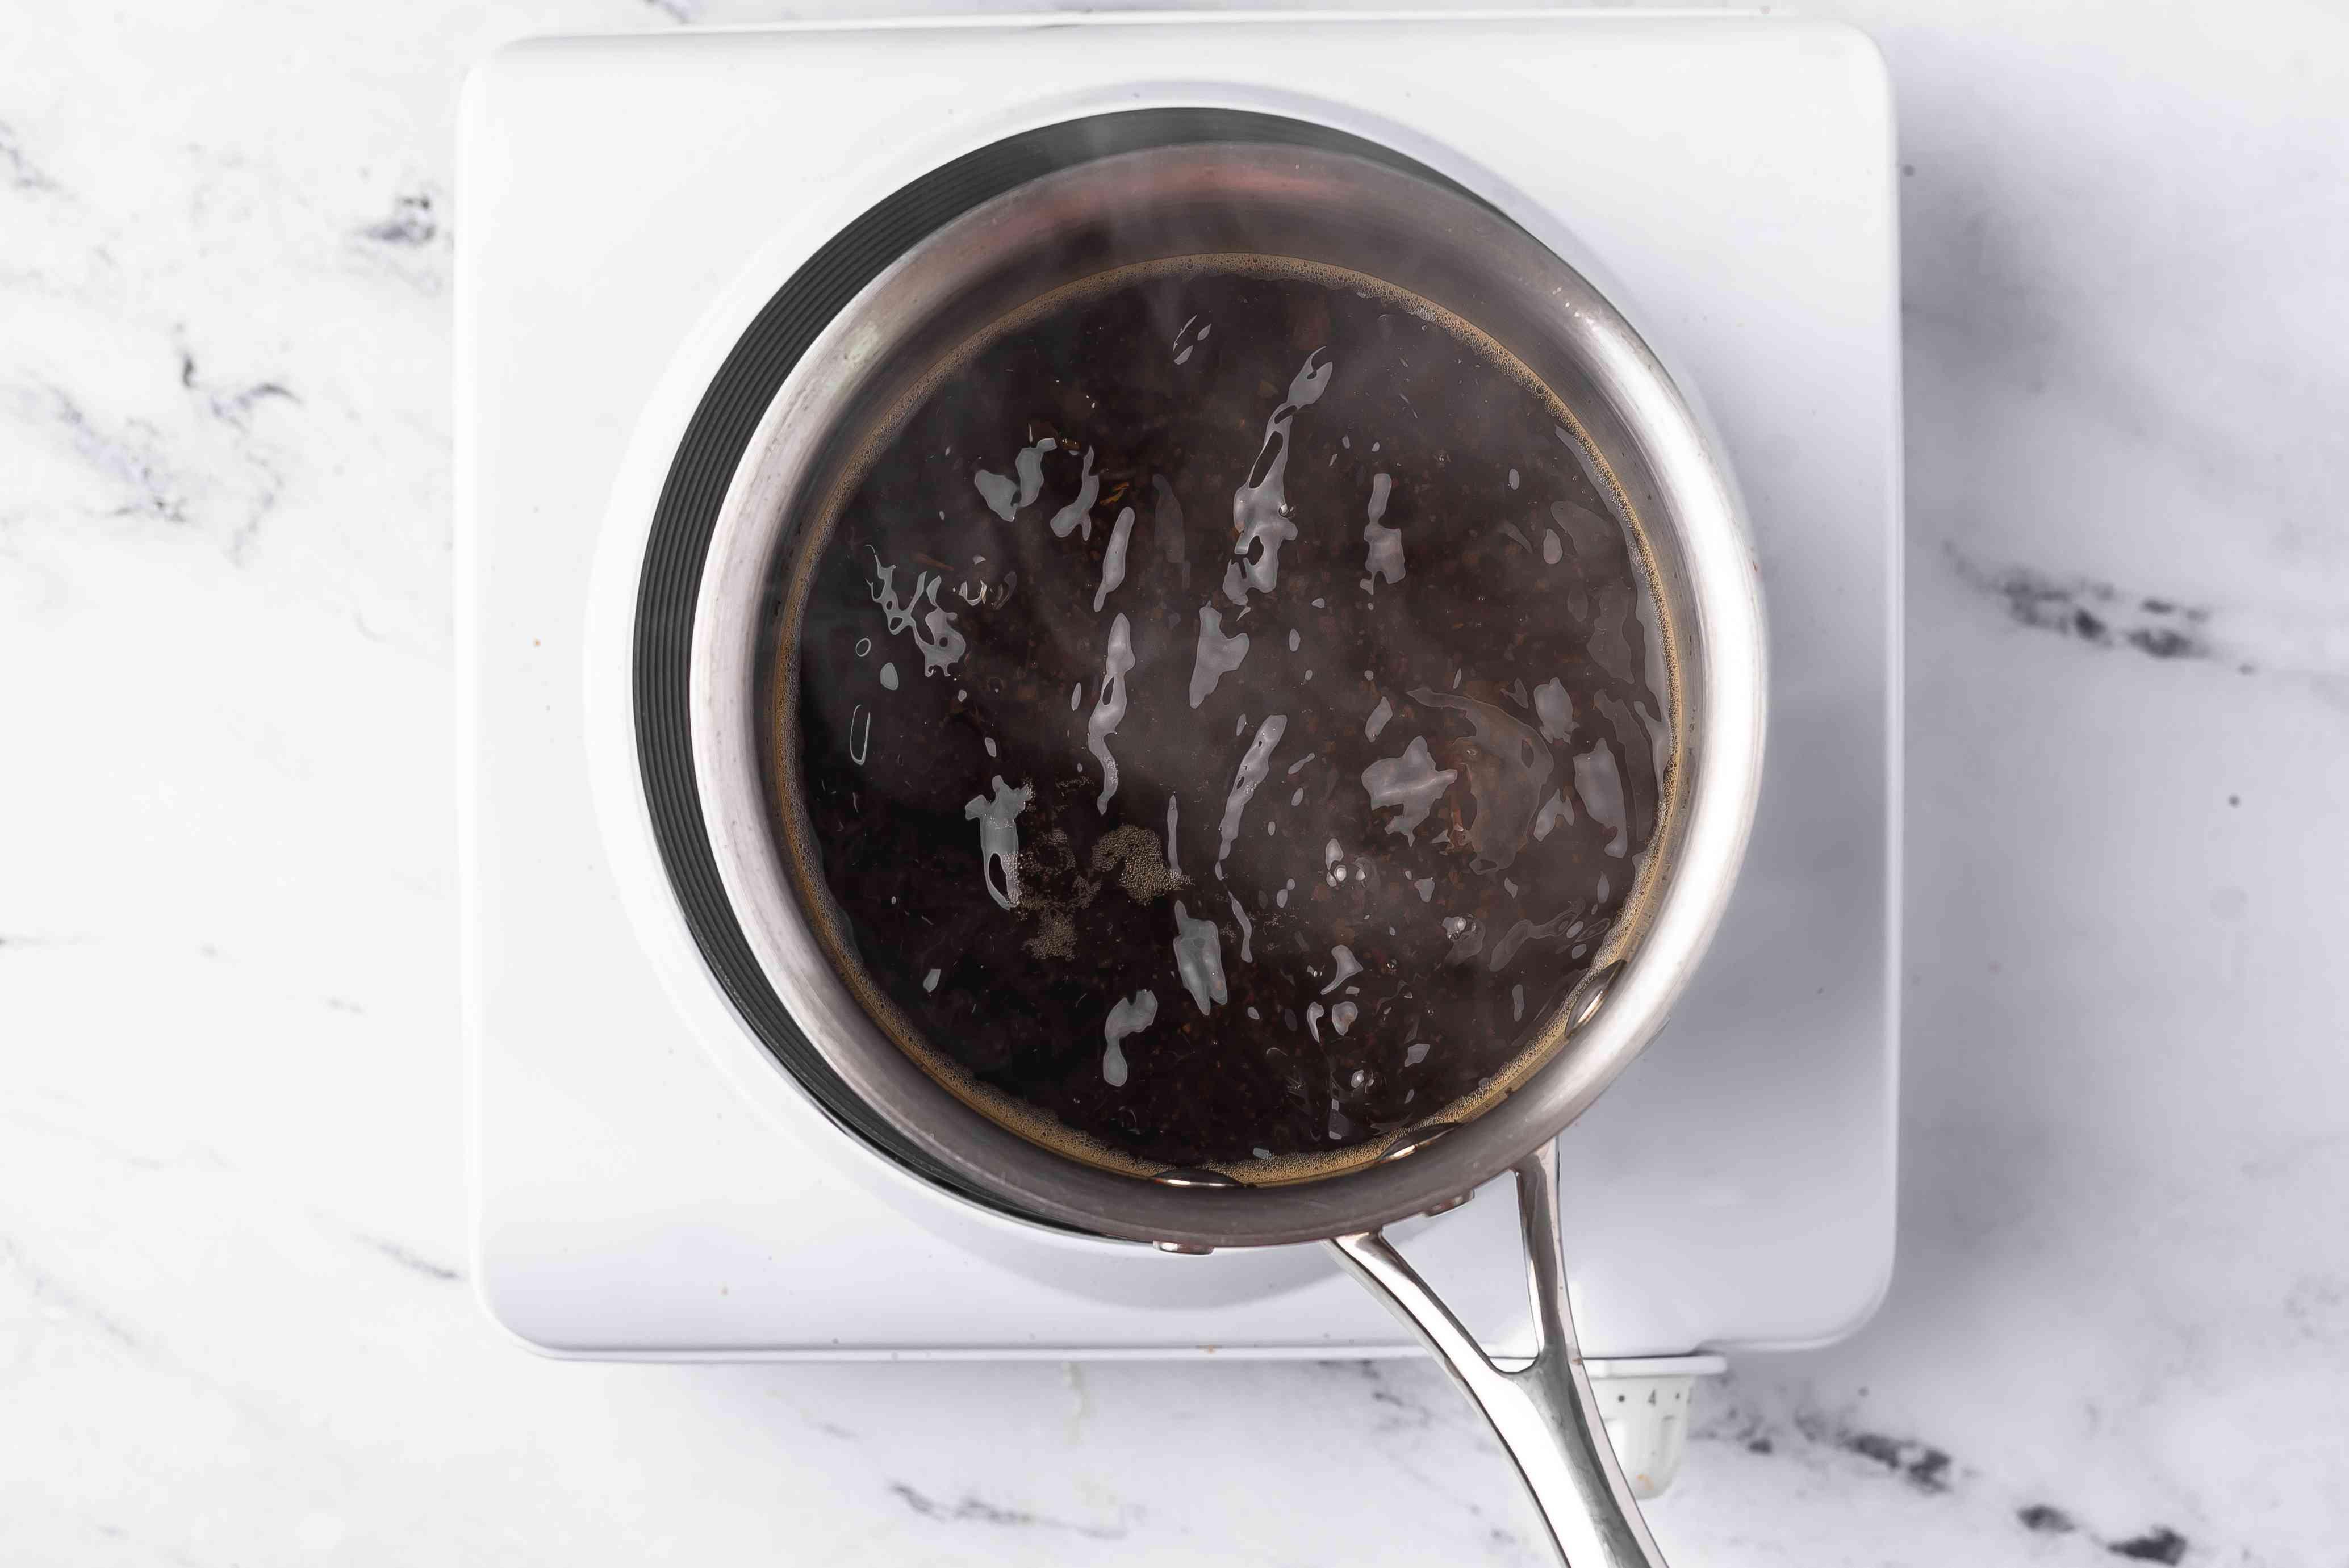 Bring tea to low boil